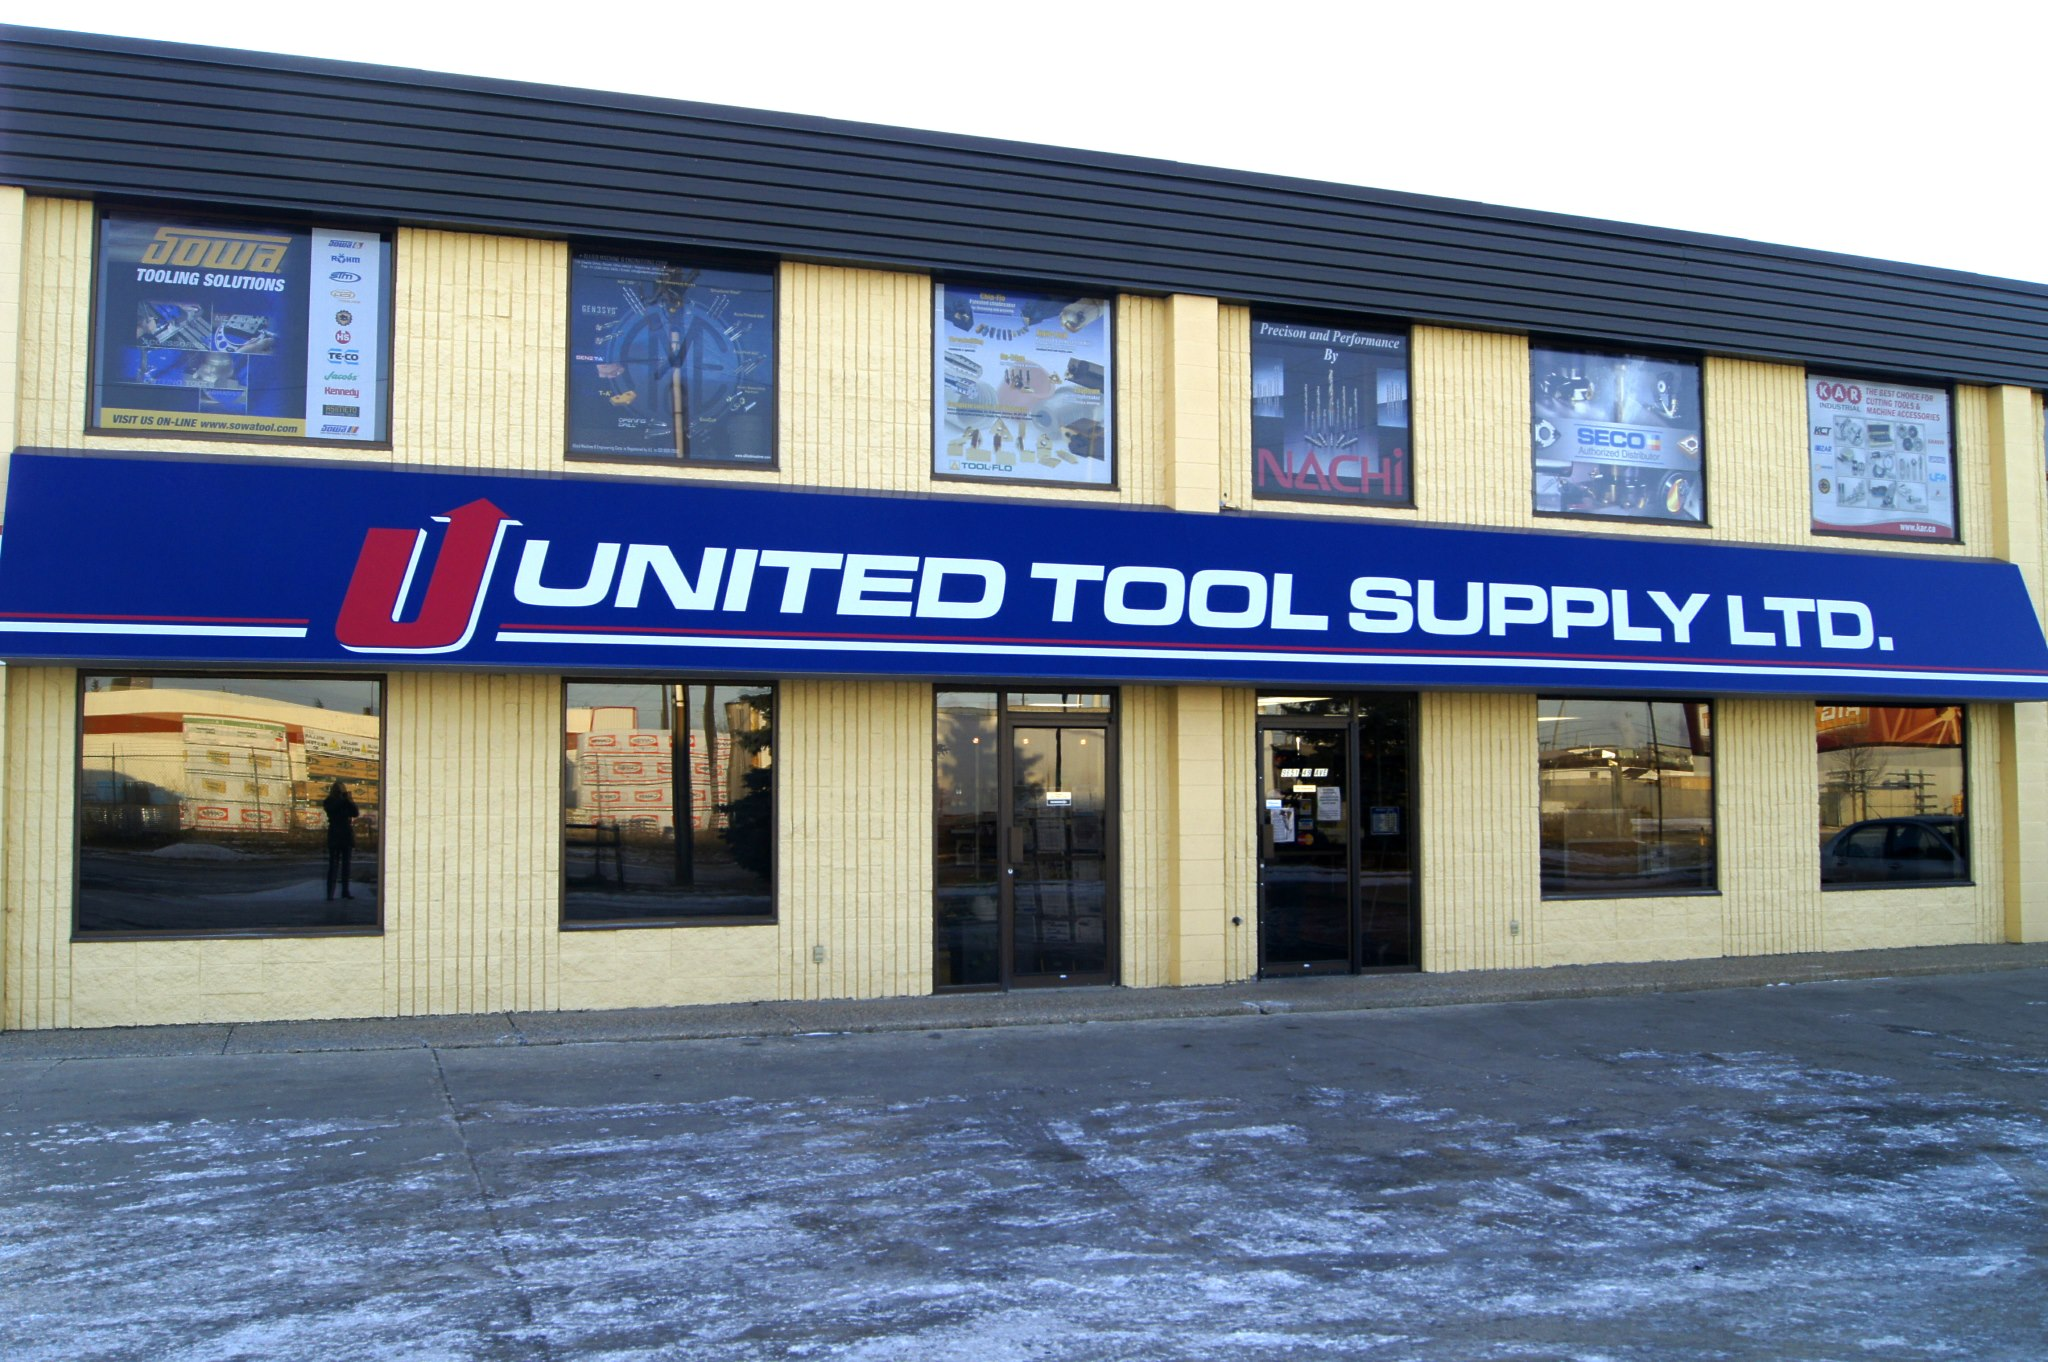 United Tool Supply Ltd logo